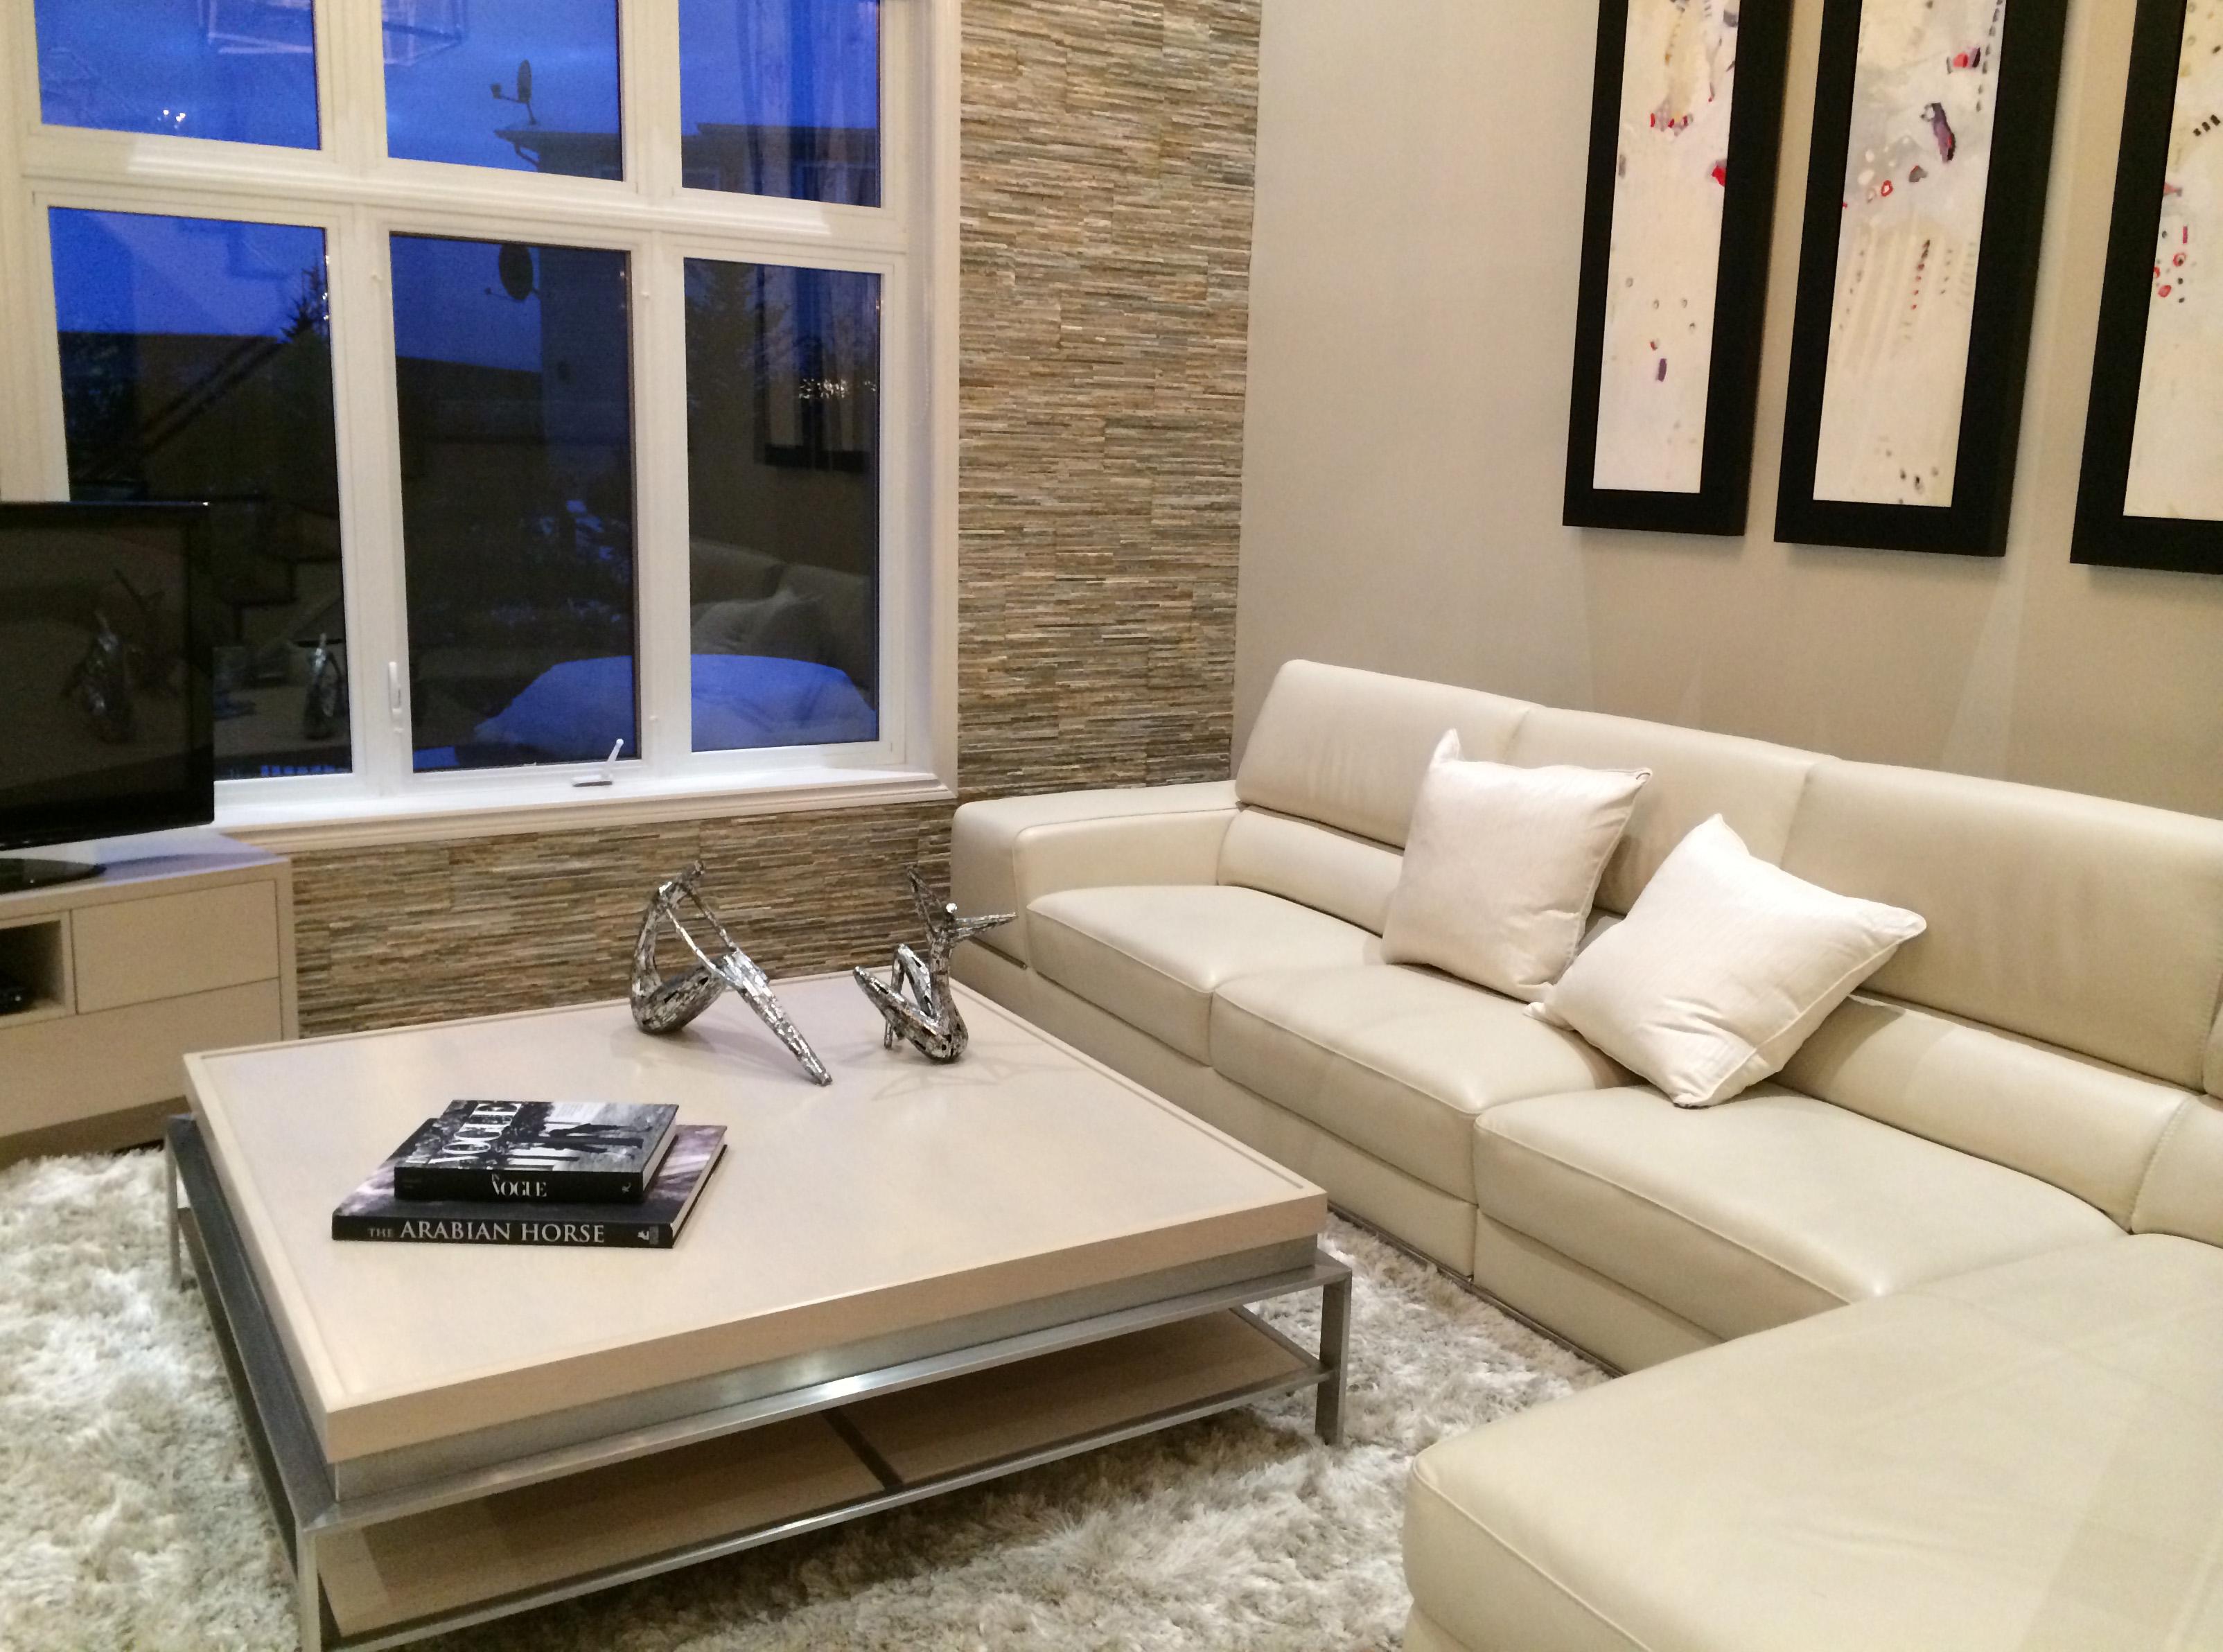 Modern home decor - Living Room and Coffee Table